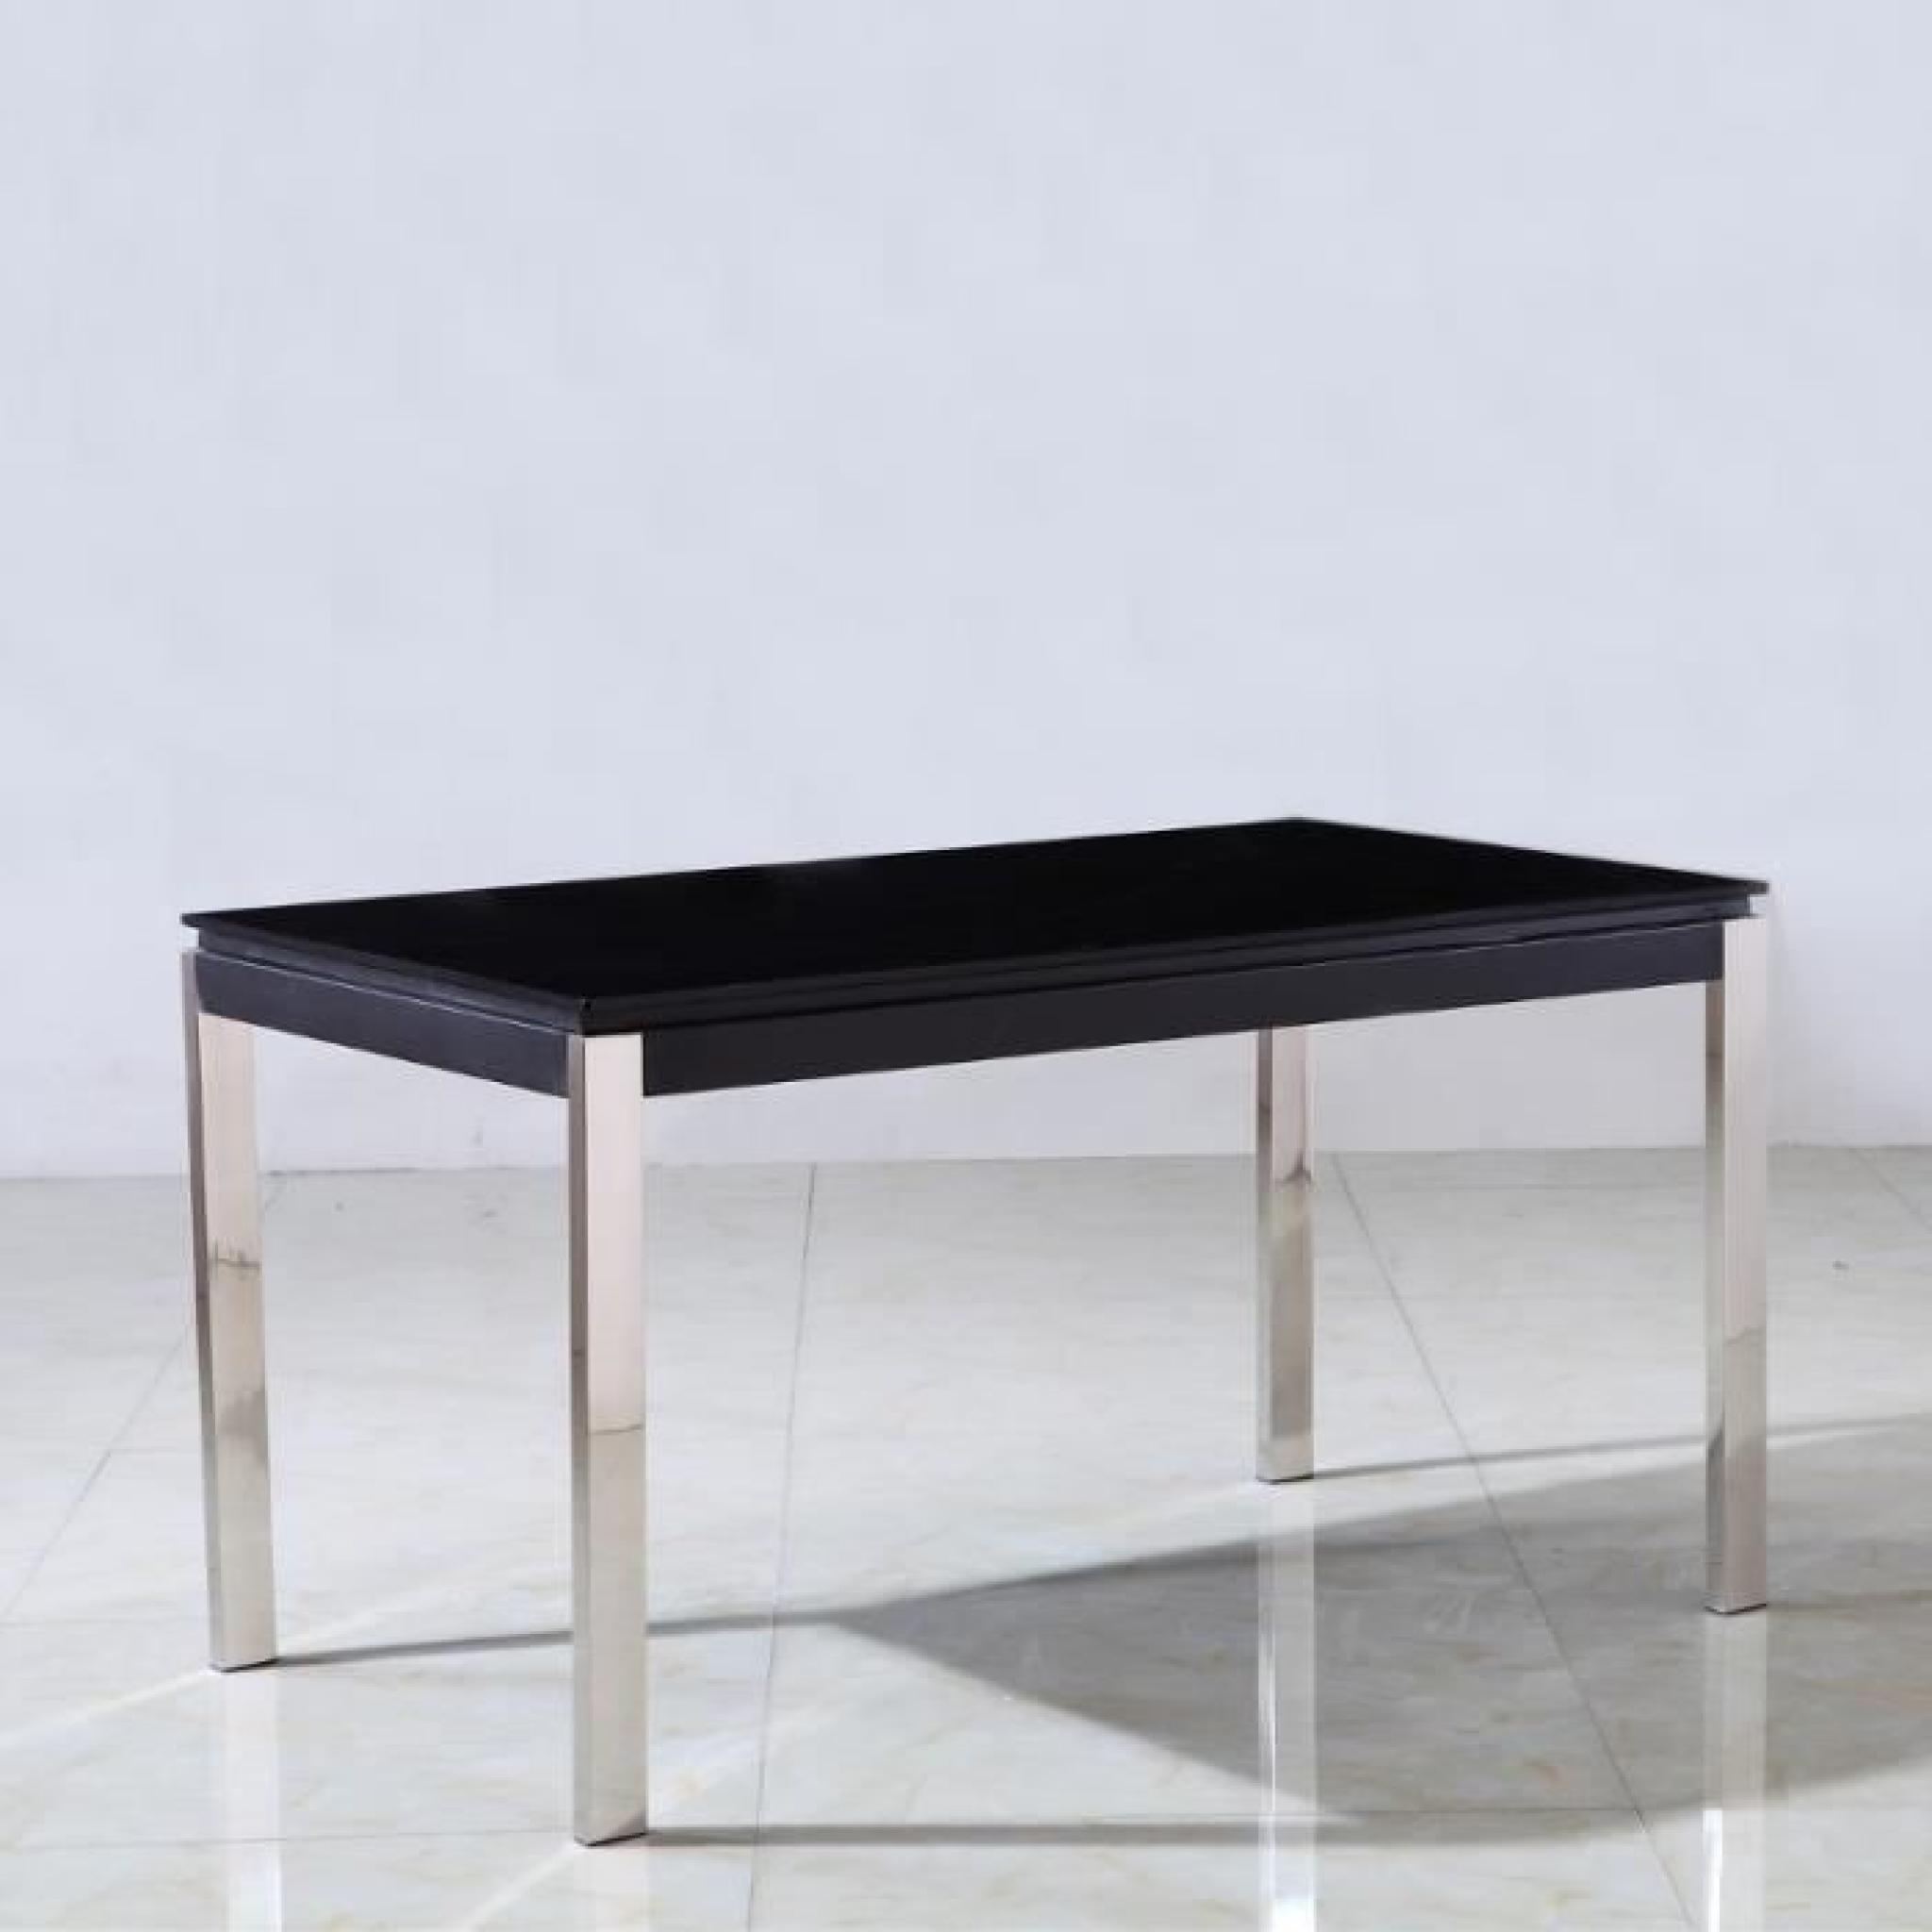 Table en verre noir et pieds inox Leros - Achat/Vente table salle a ...